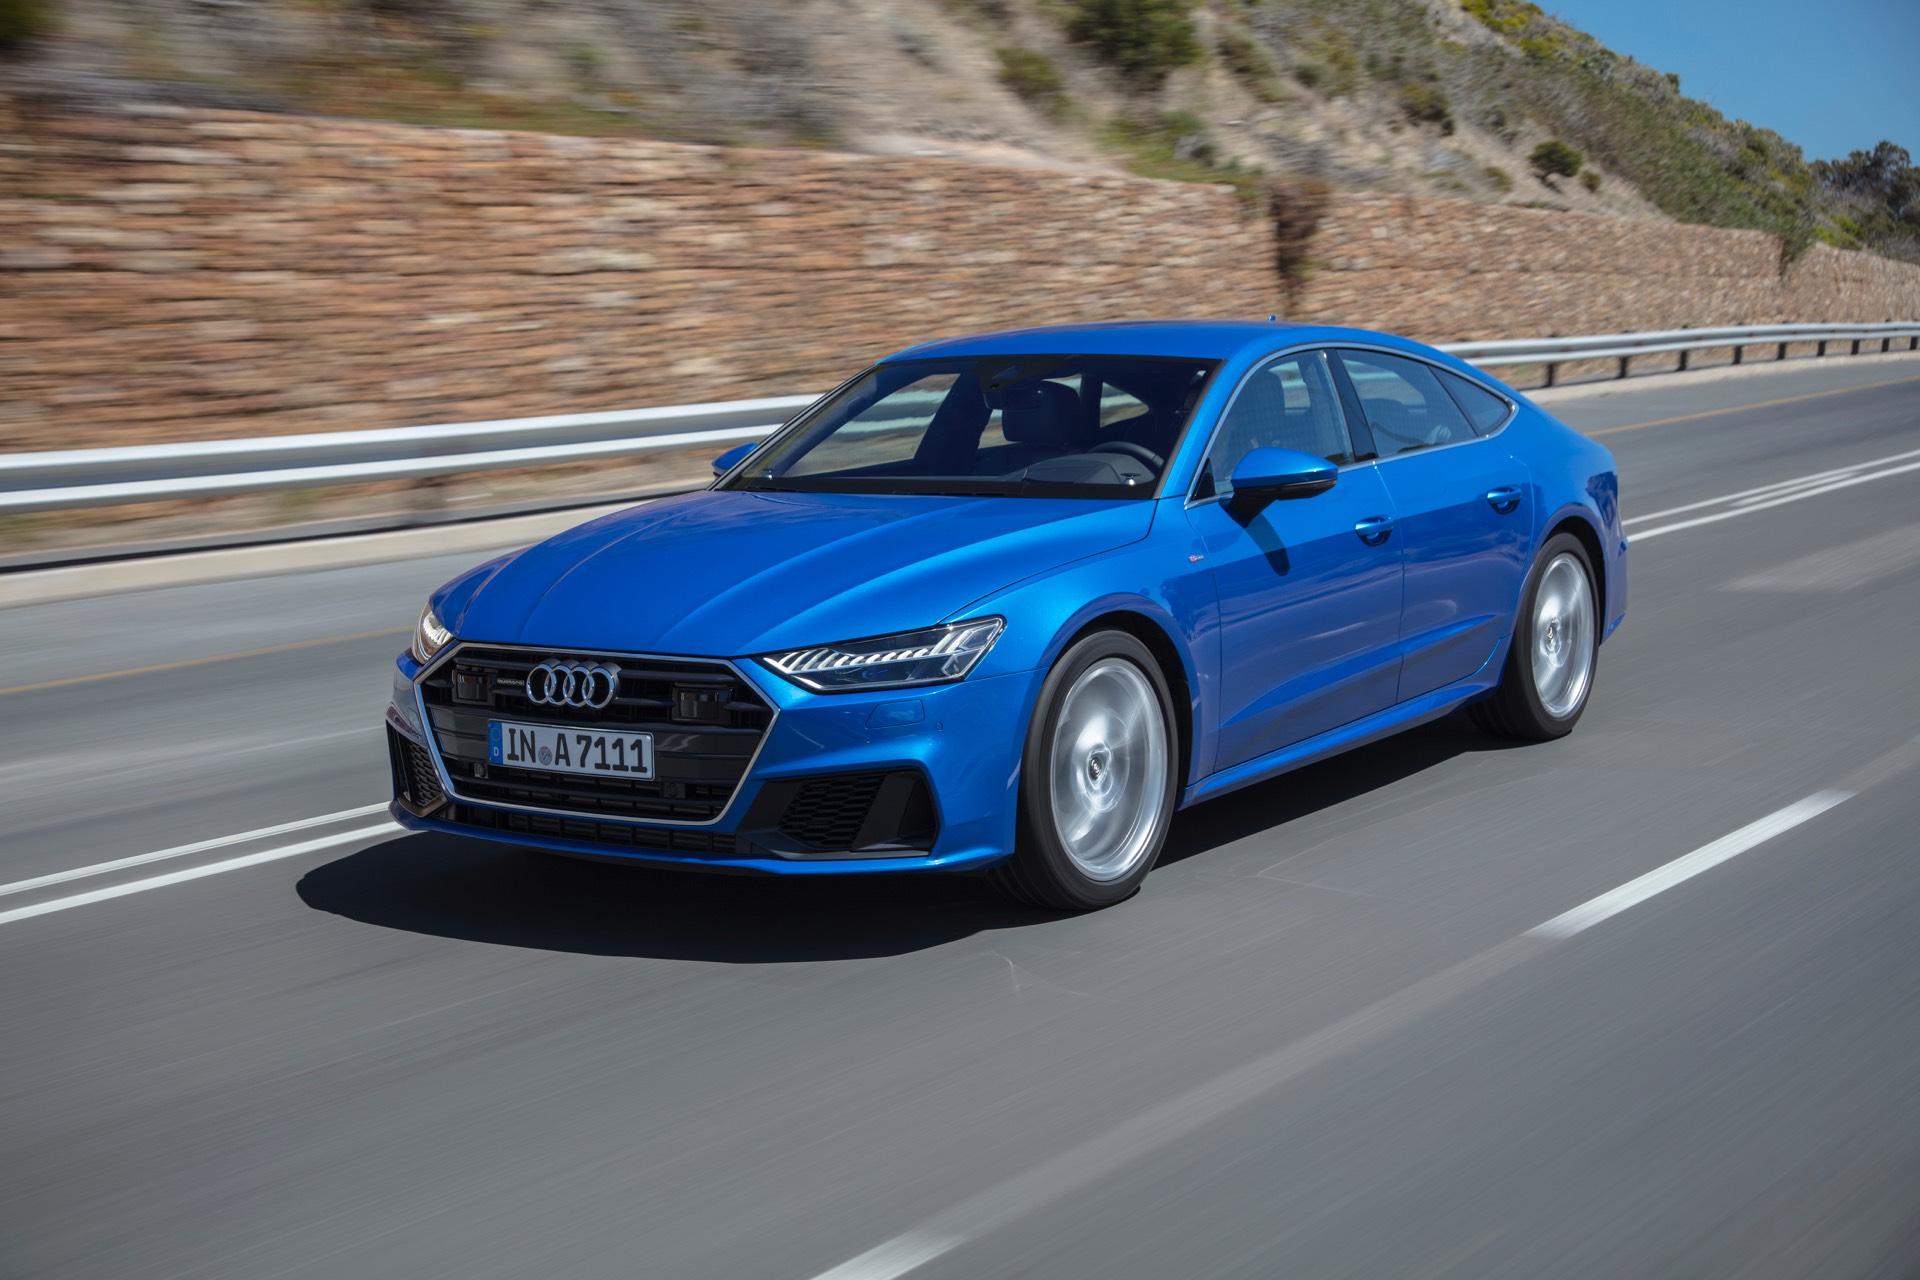 Audi A Review GTspirit - Audi a7 review